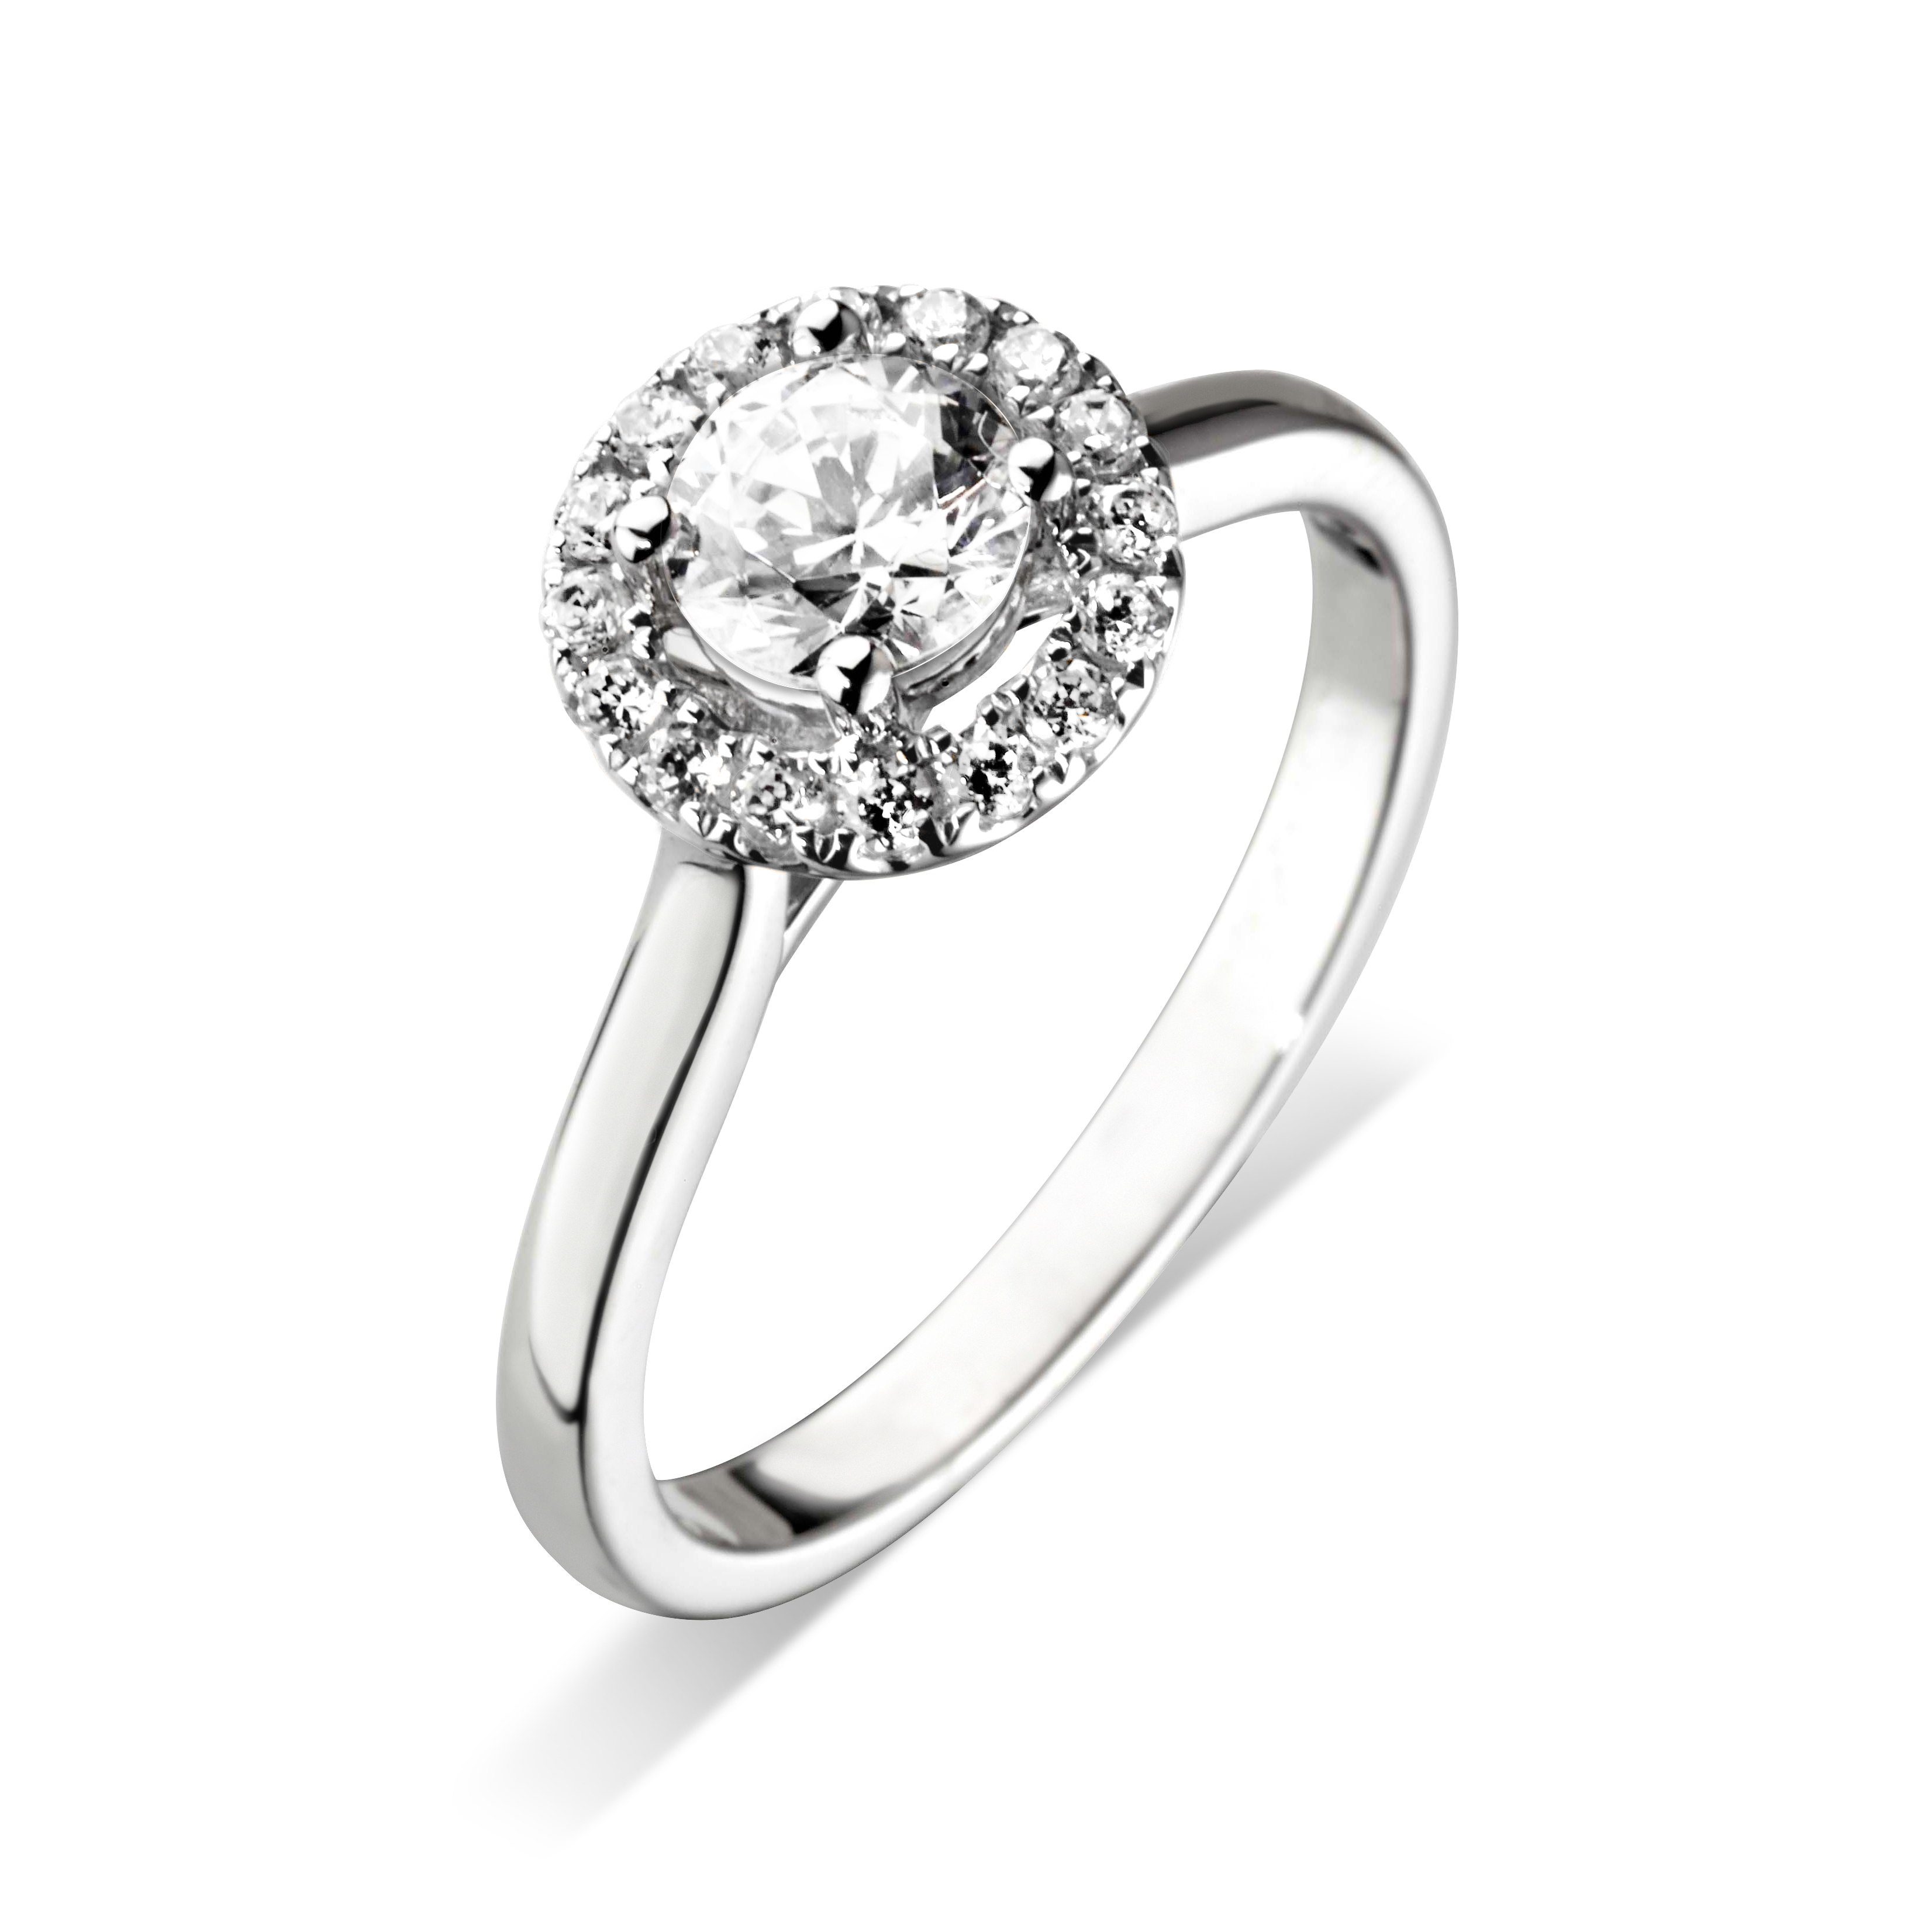 Williamson Brown Platinum Halo Engagement Ring Williamson Brown